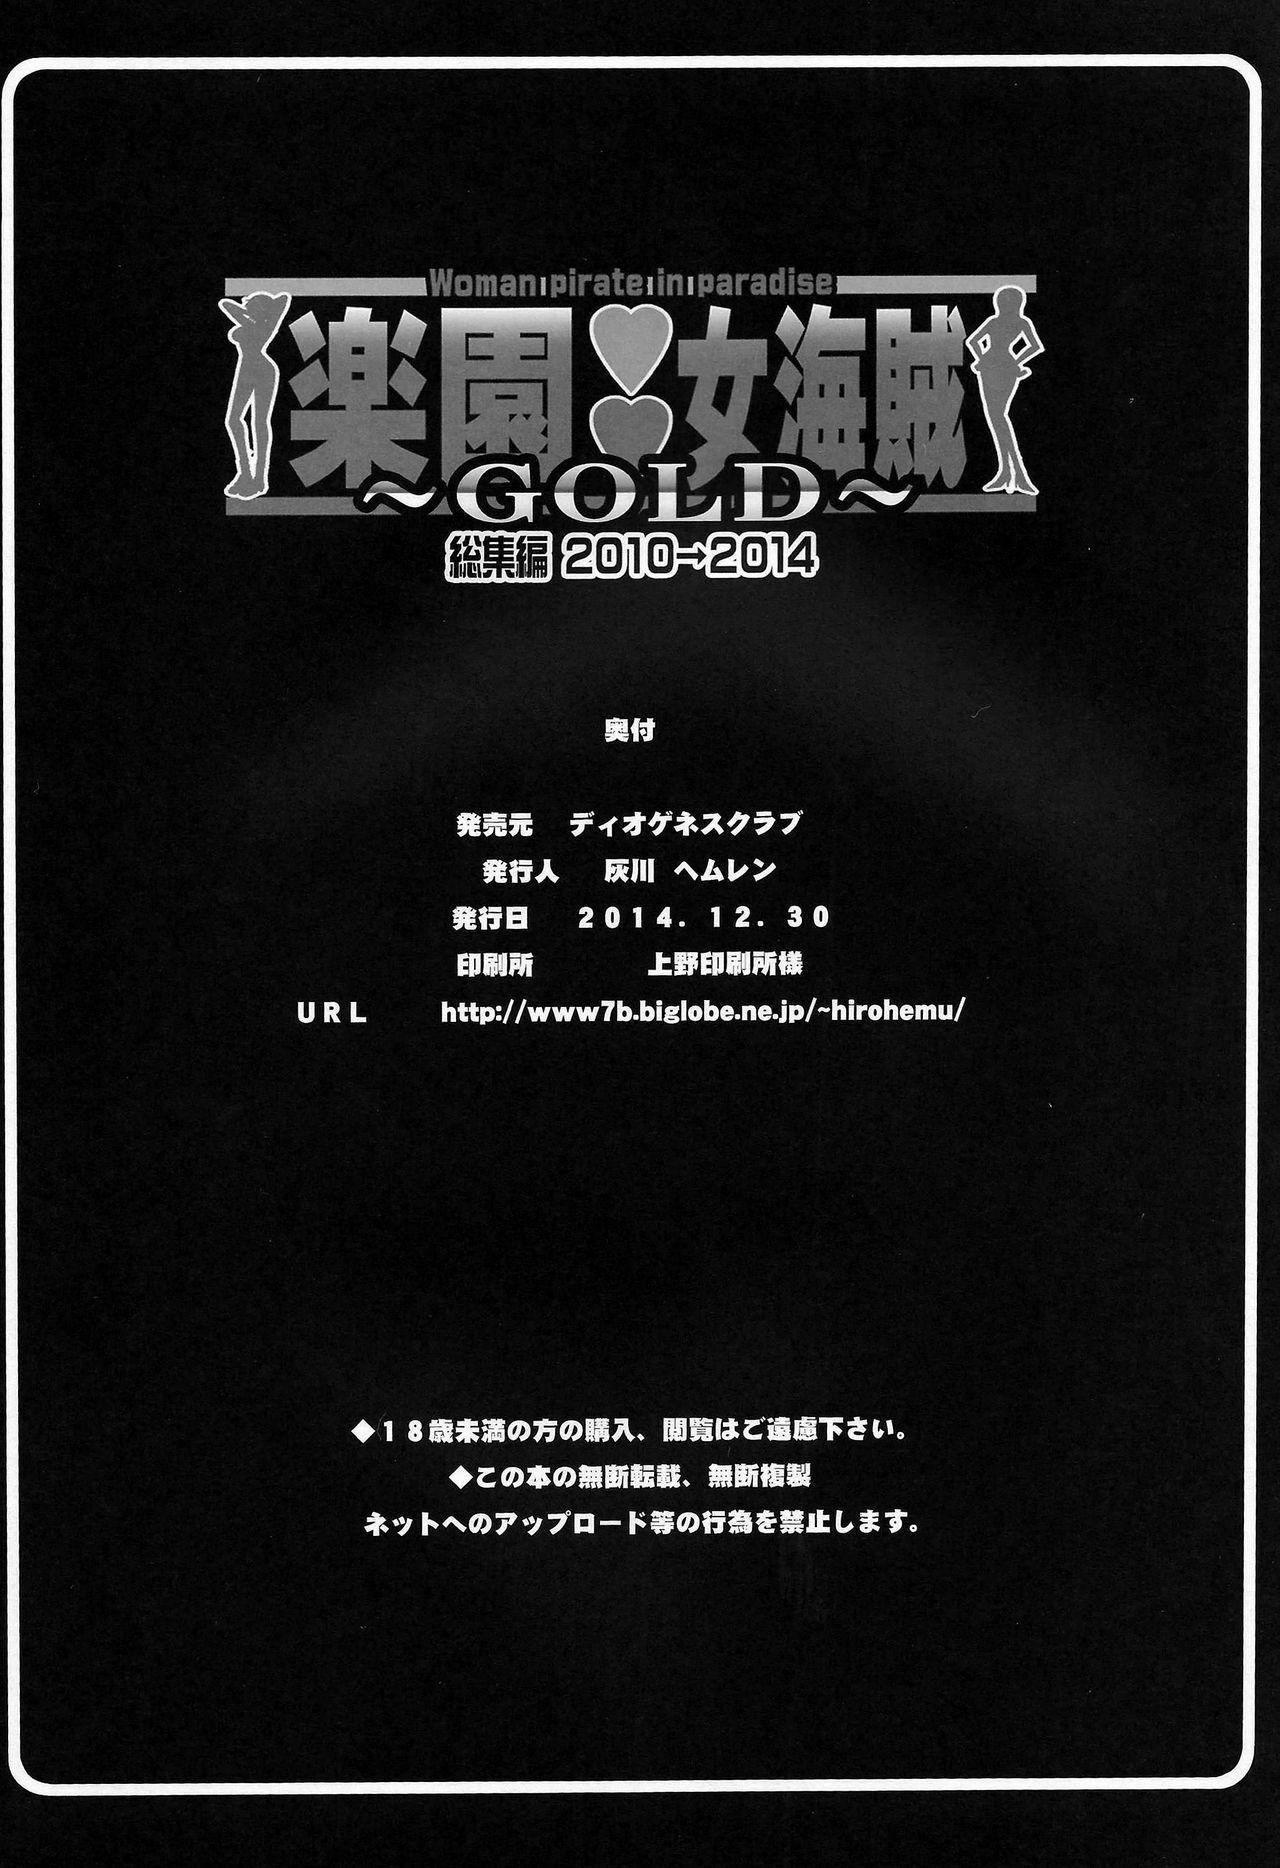 (C87) [Diogenes Club (Haikawa Hemlen)] Rakuen Onna Kaizoku Soushuuhen ~GOLD~ - Woman Pirate in Paradise (One Piece) [English] {doujin-moe.us} [Incomplete] 13